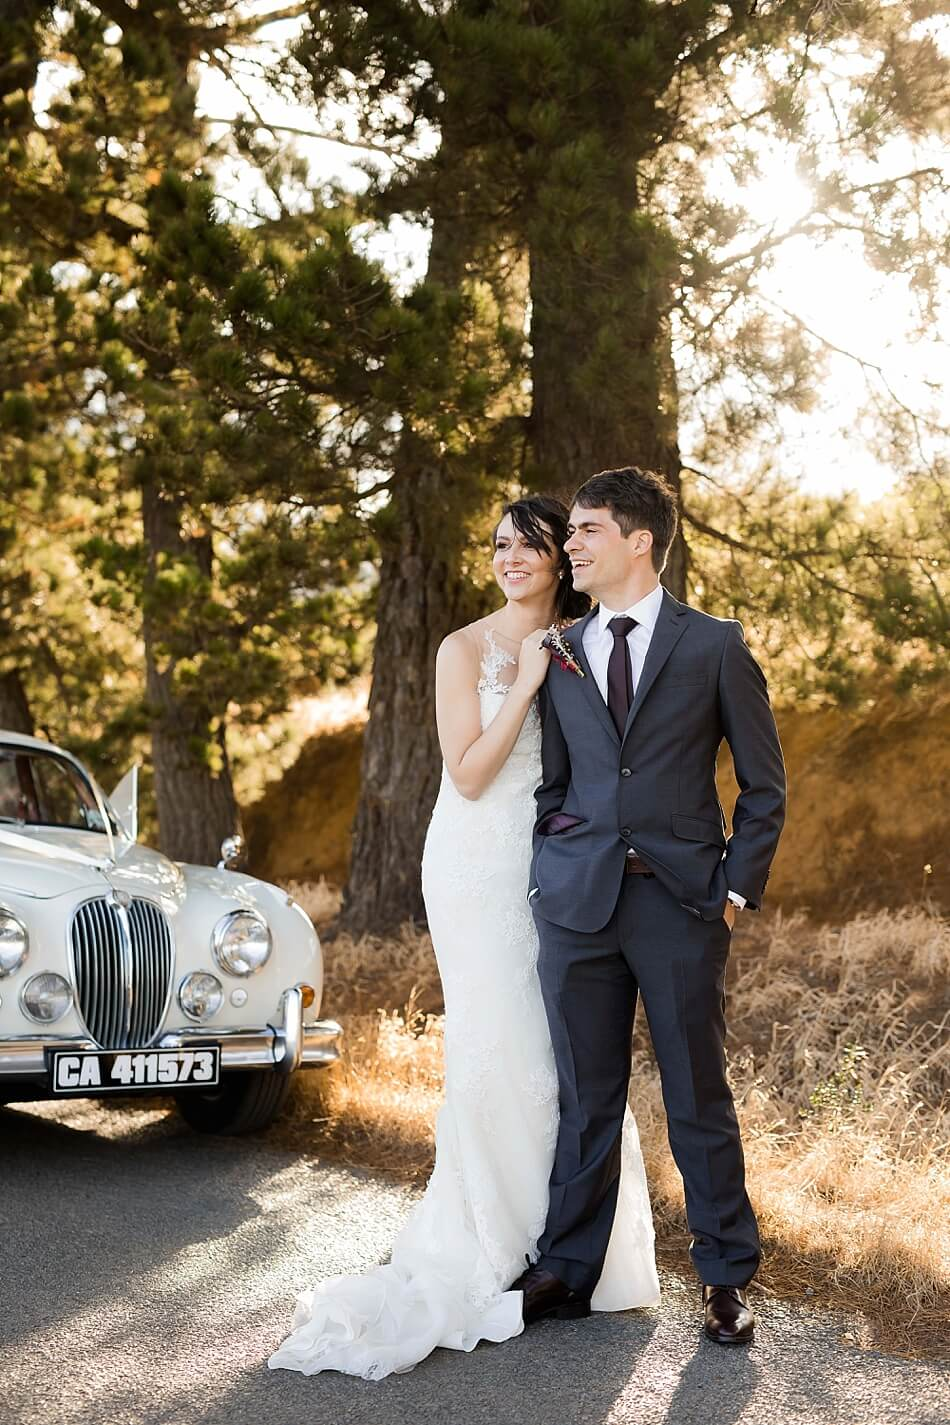 nikki-meyer_landtscap_stellenbosch_wedding_photographer_082